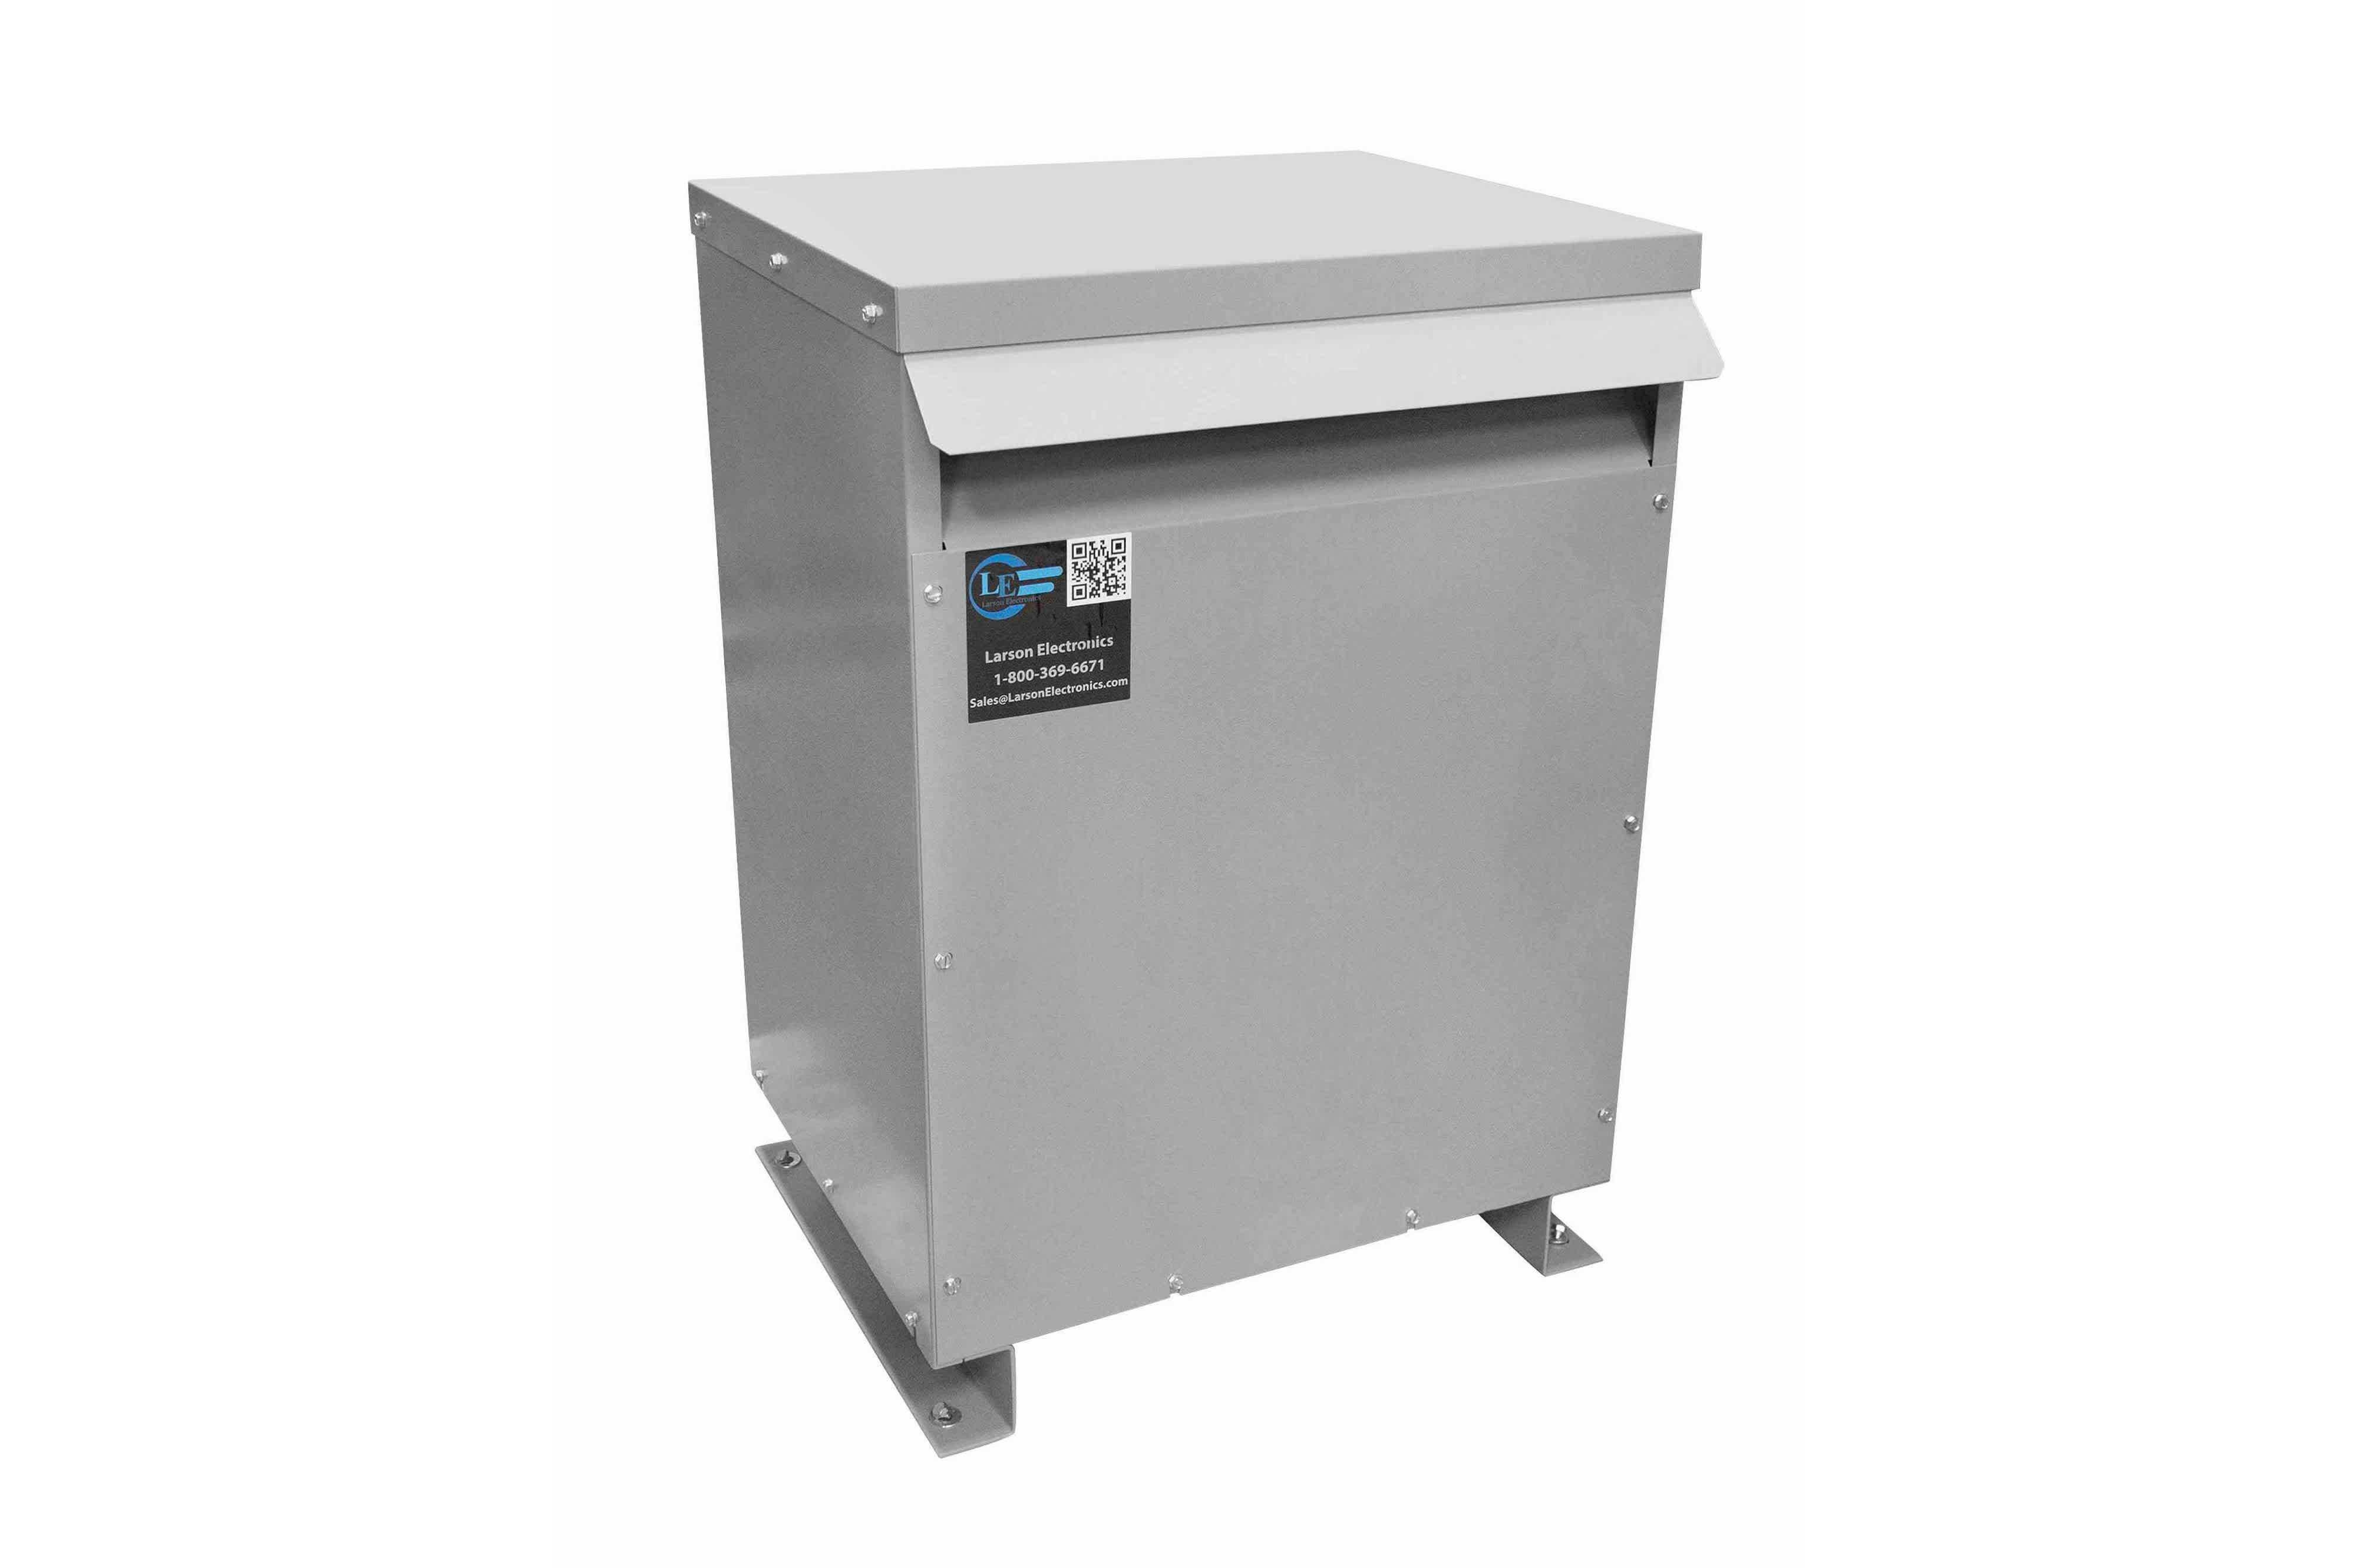 1000 kVA 3PH Isolation Transformer, 460V Wye Primary, 240V Delta Secondary, N3R, Ventilated, 60 Hz